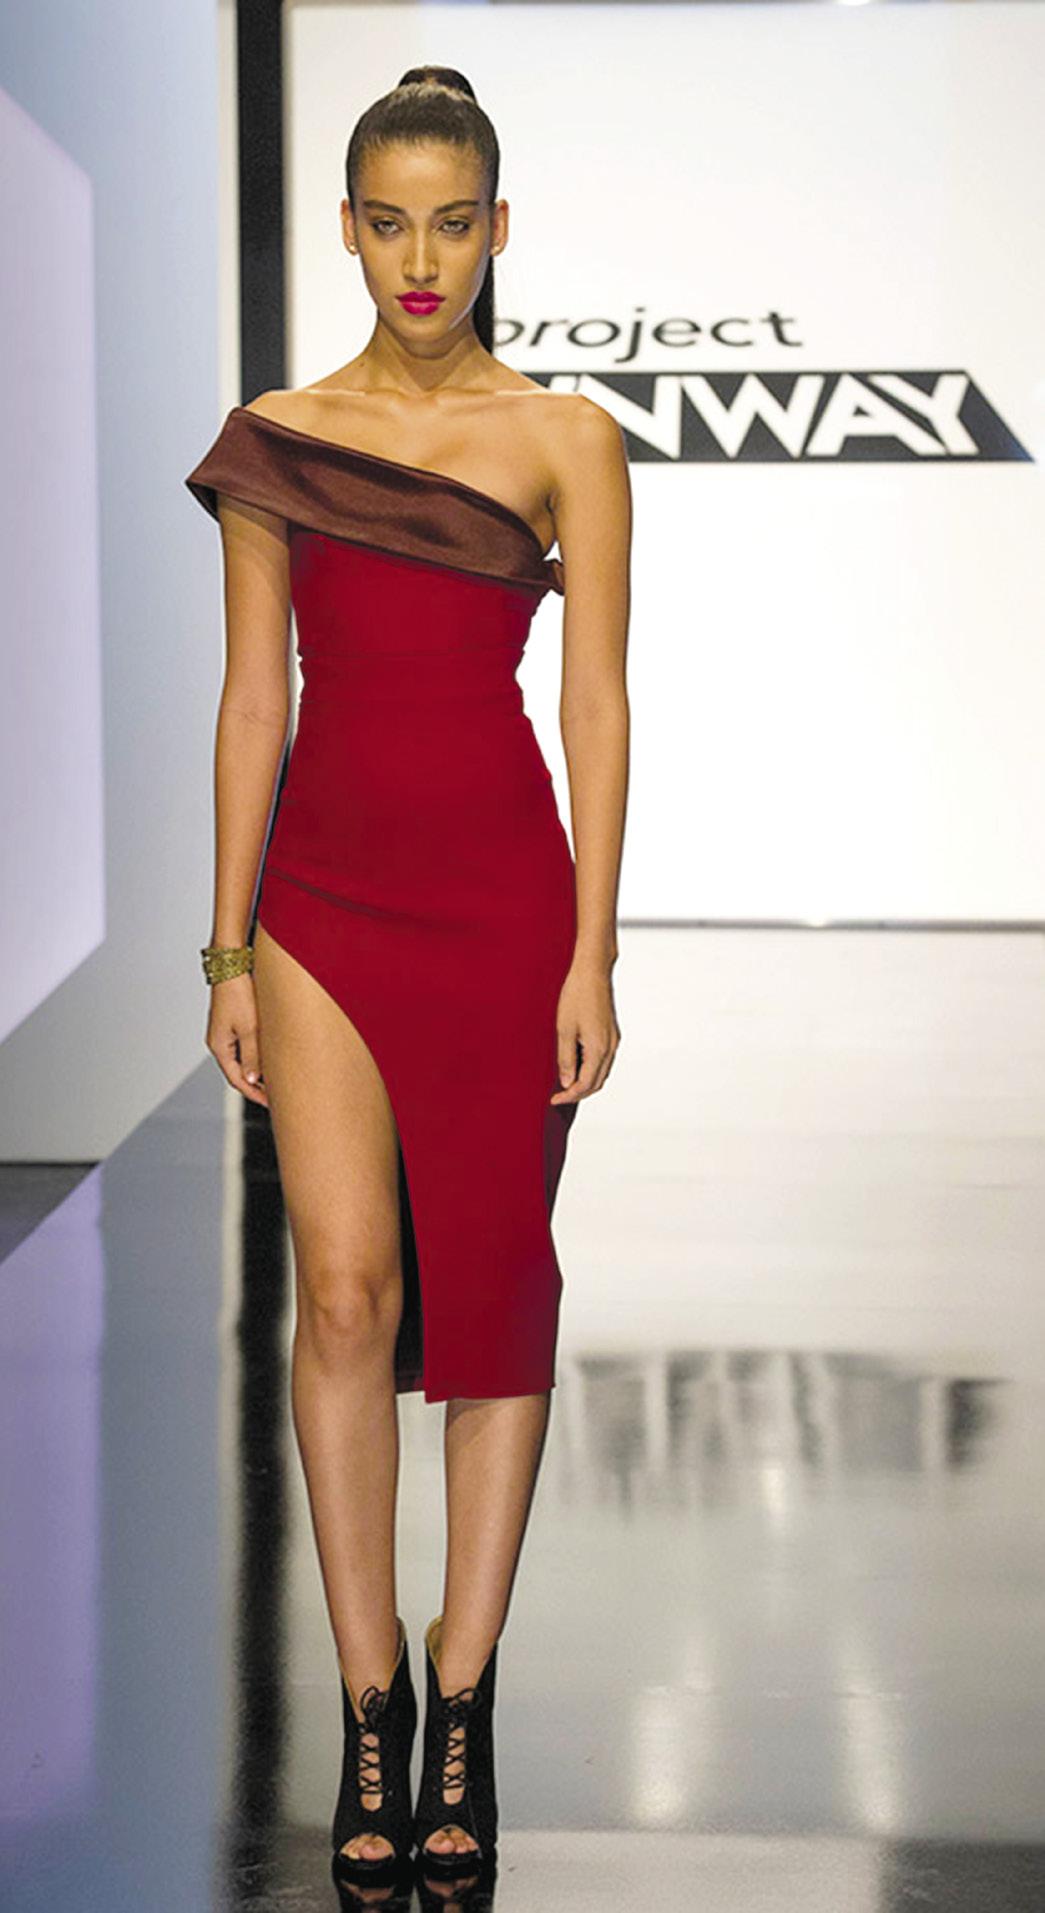 Project Runway Laurie Underwood dress